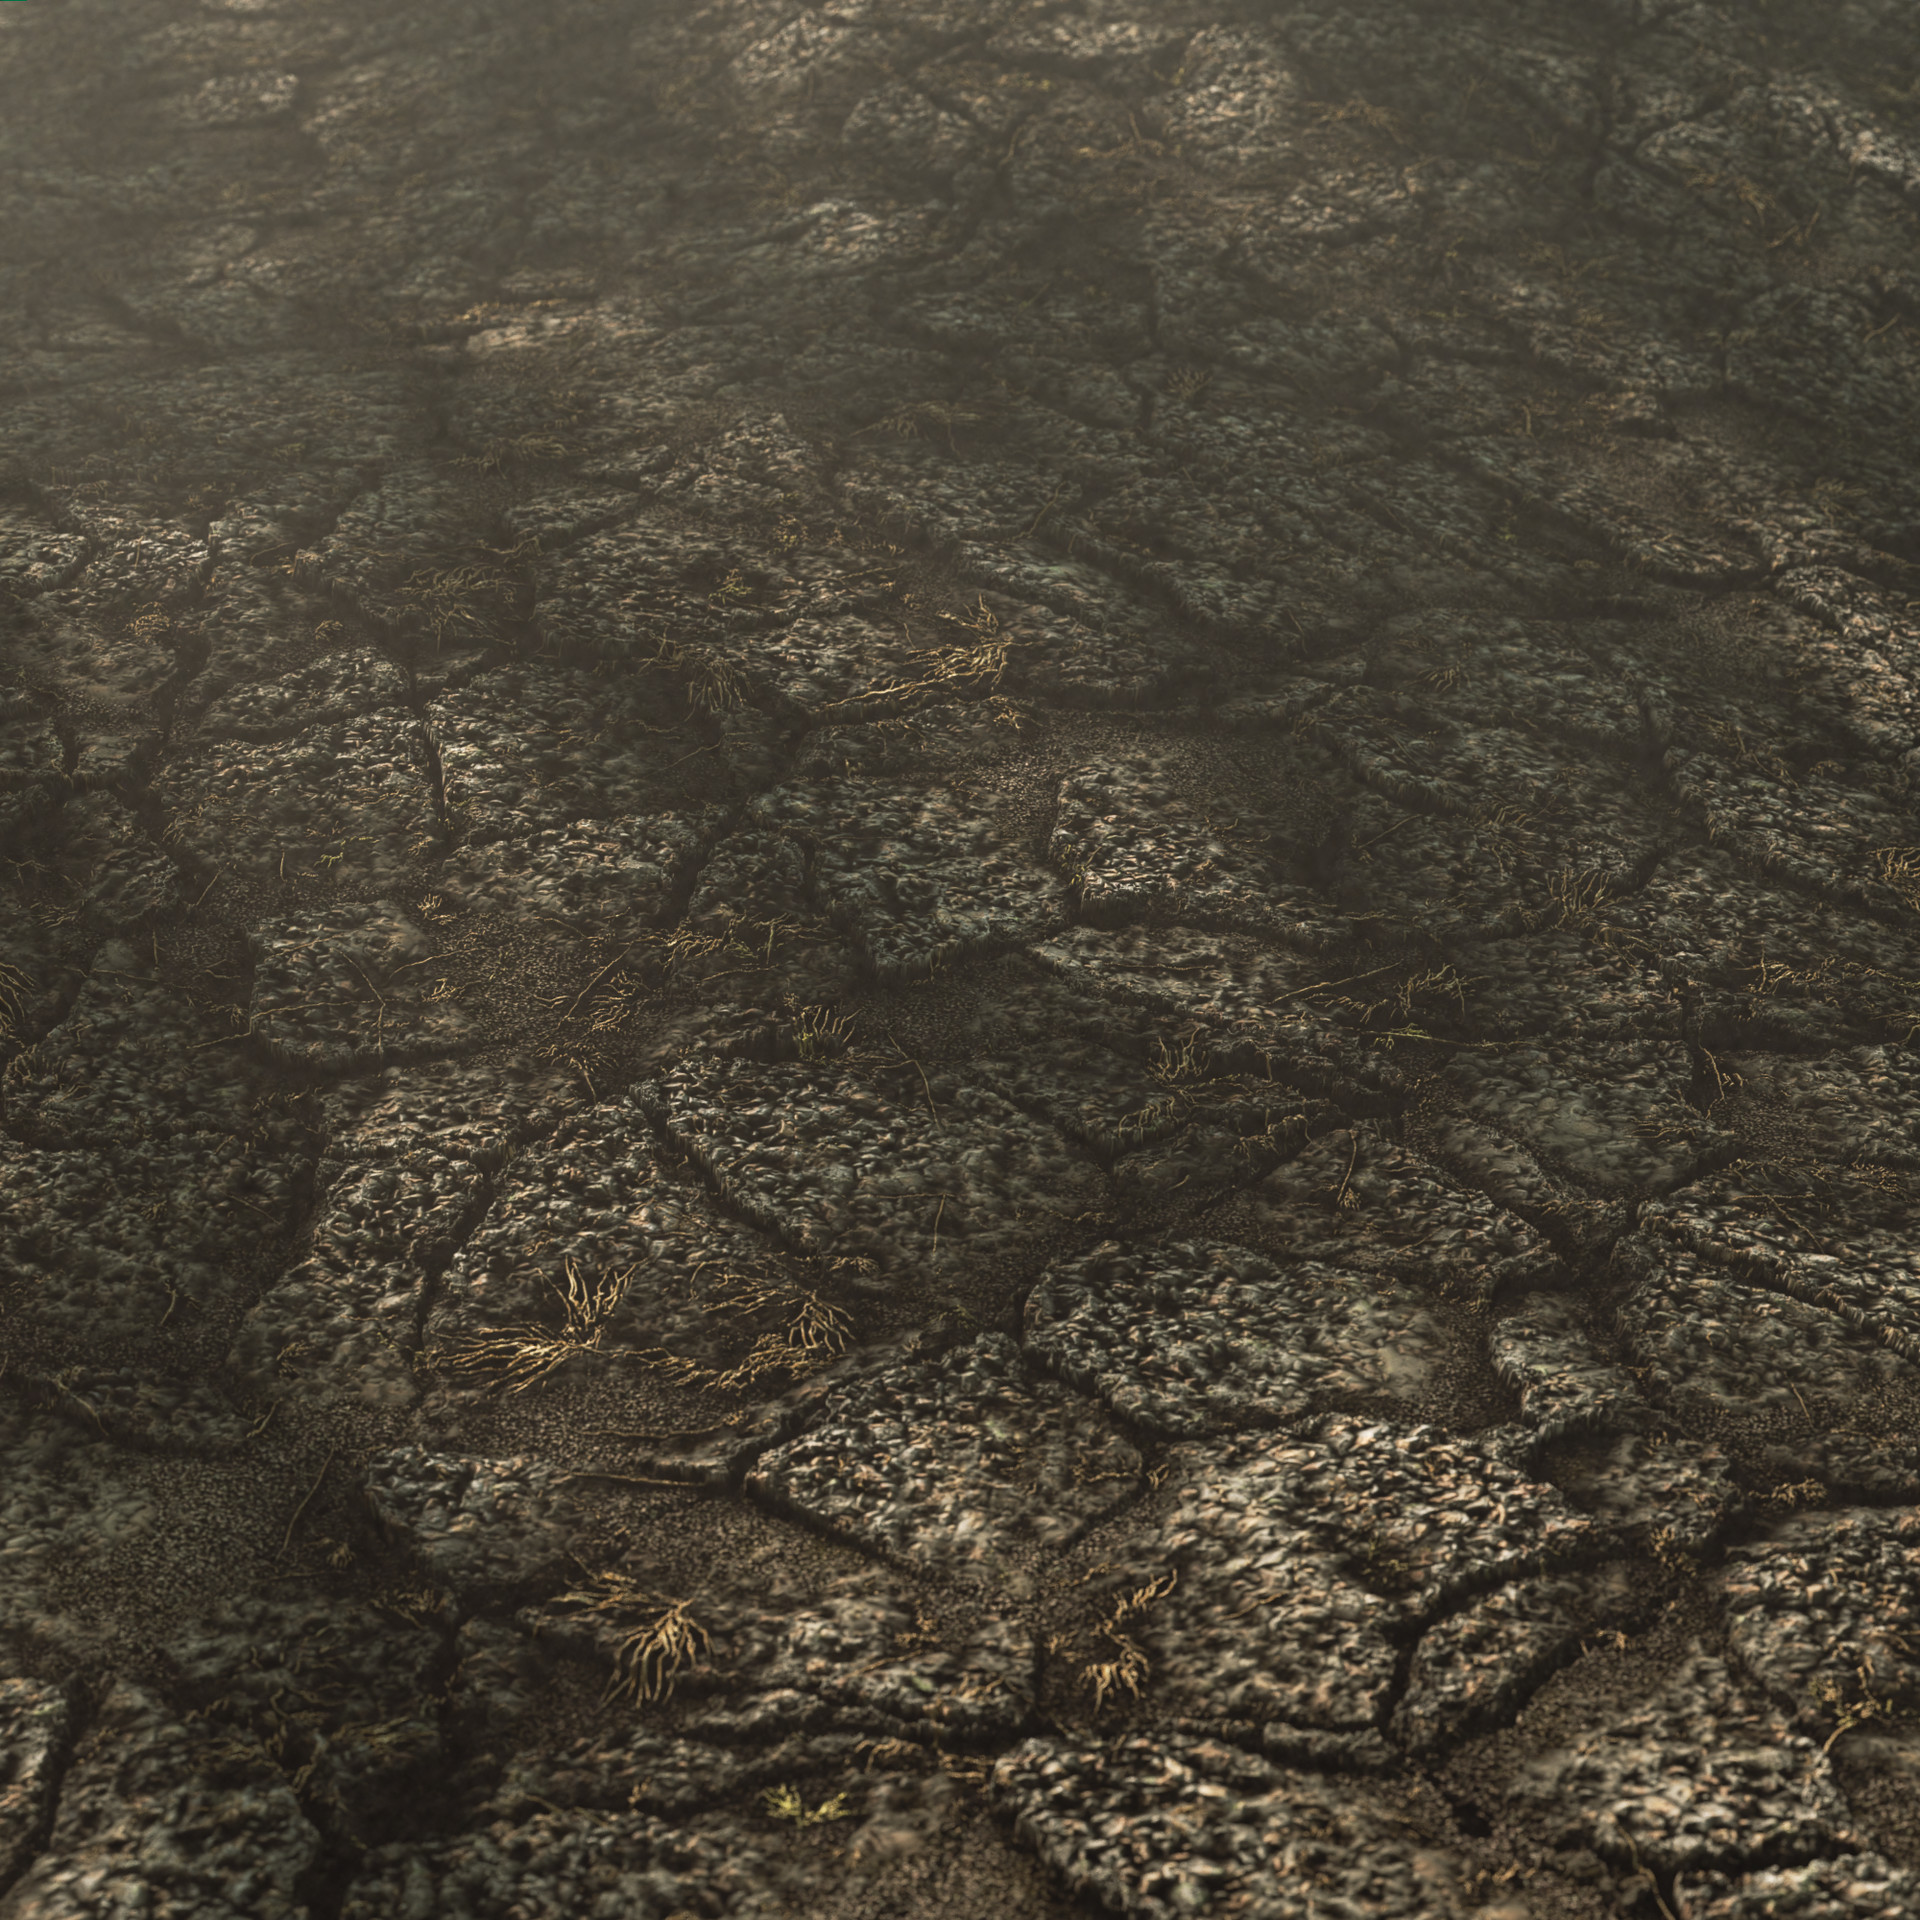 Cem tezcan hard soil ground 00001 beauty